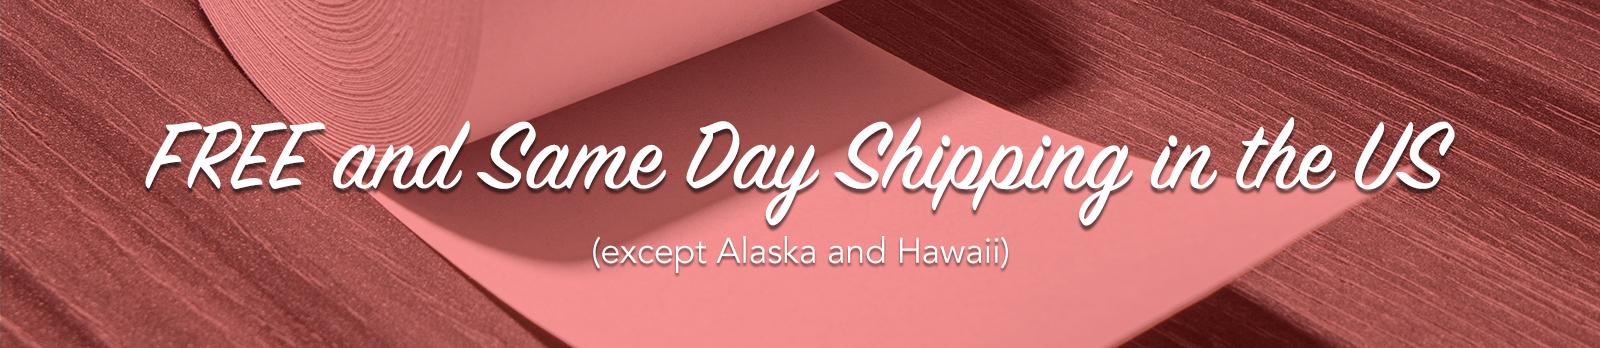 free-shipping-shipping-home-banner.jpg